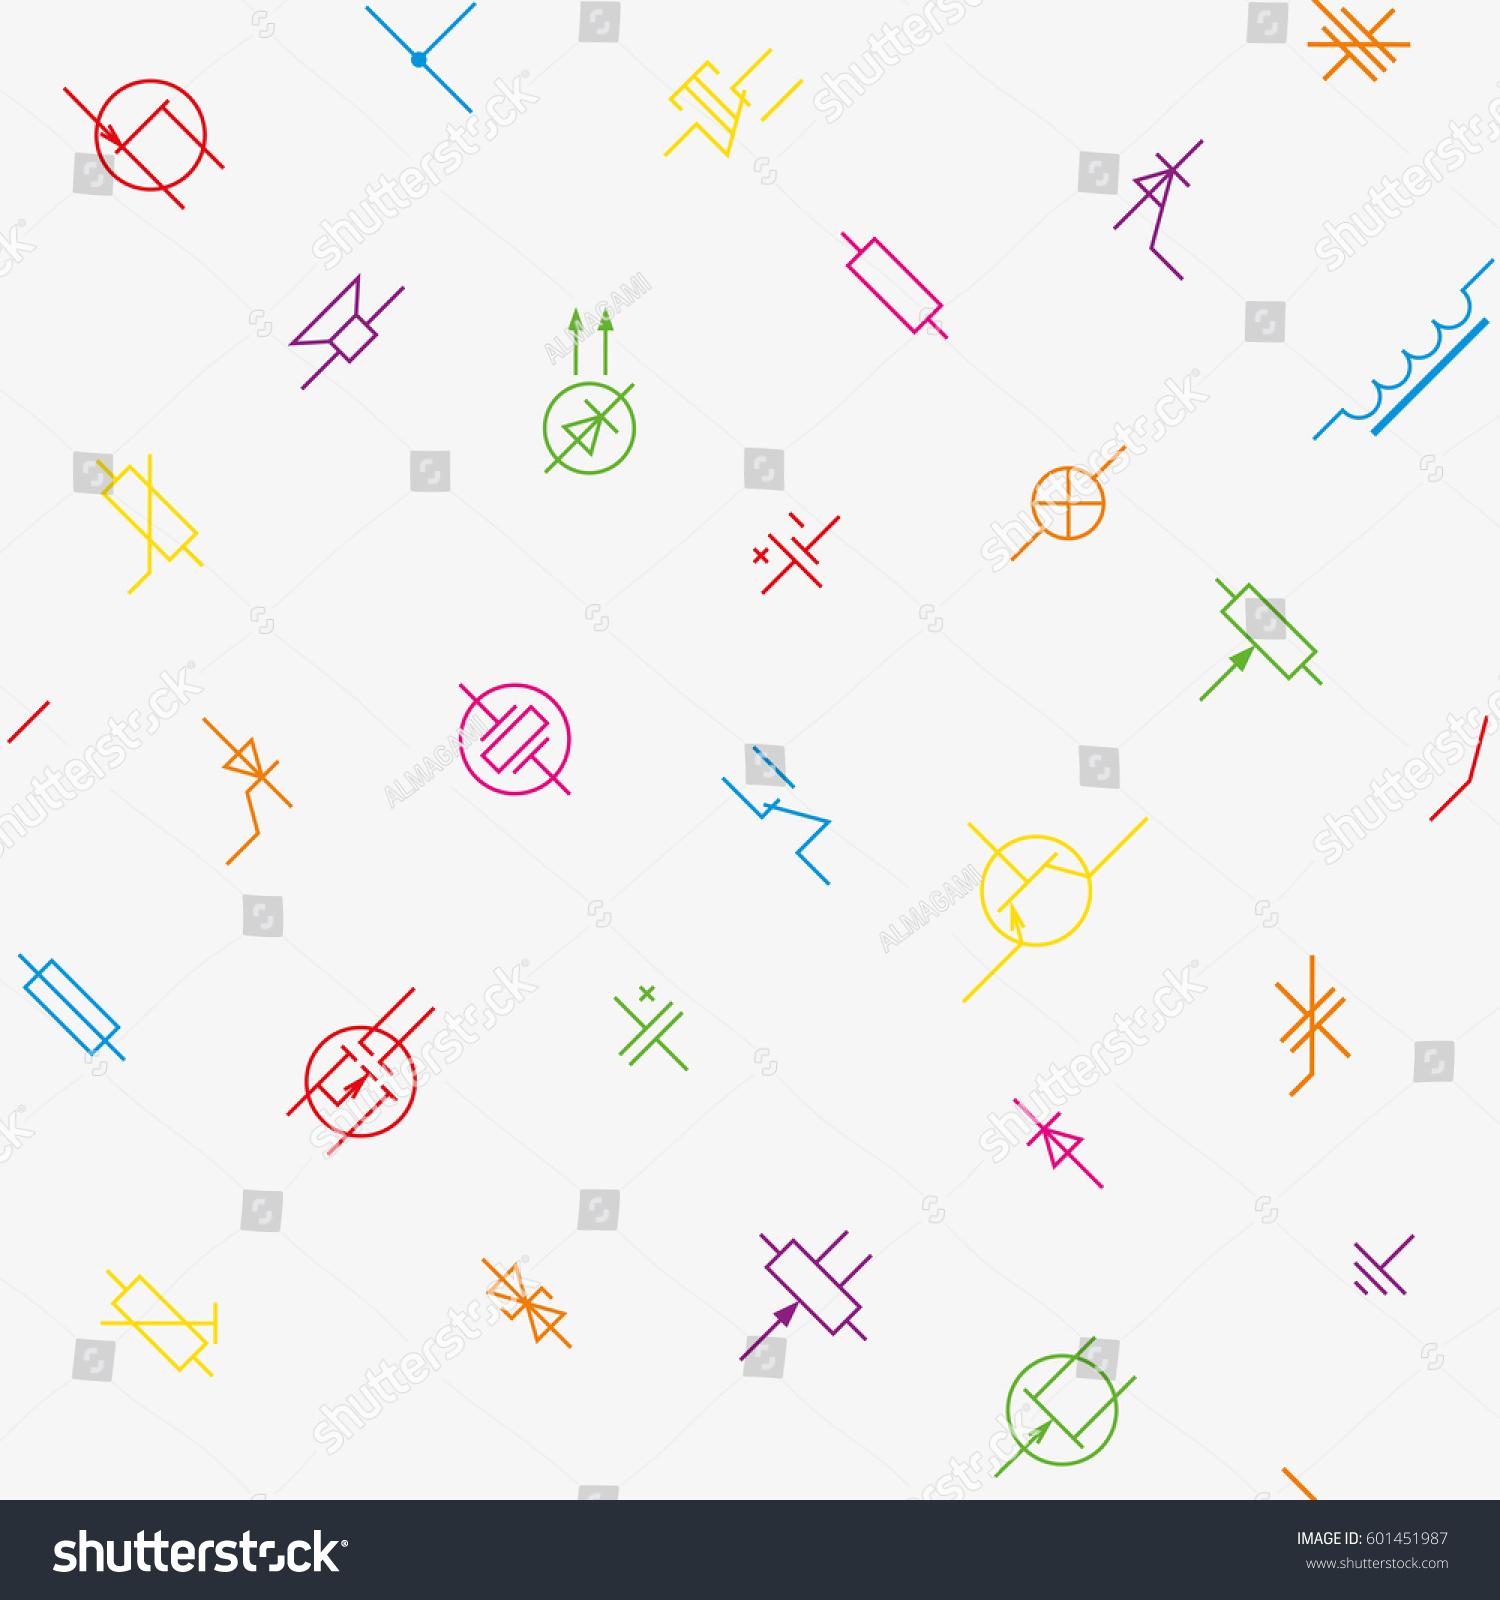 Electronics Circuit Components Symbols Seamless Wallpaper Stock ...